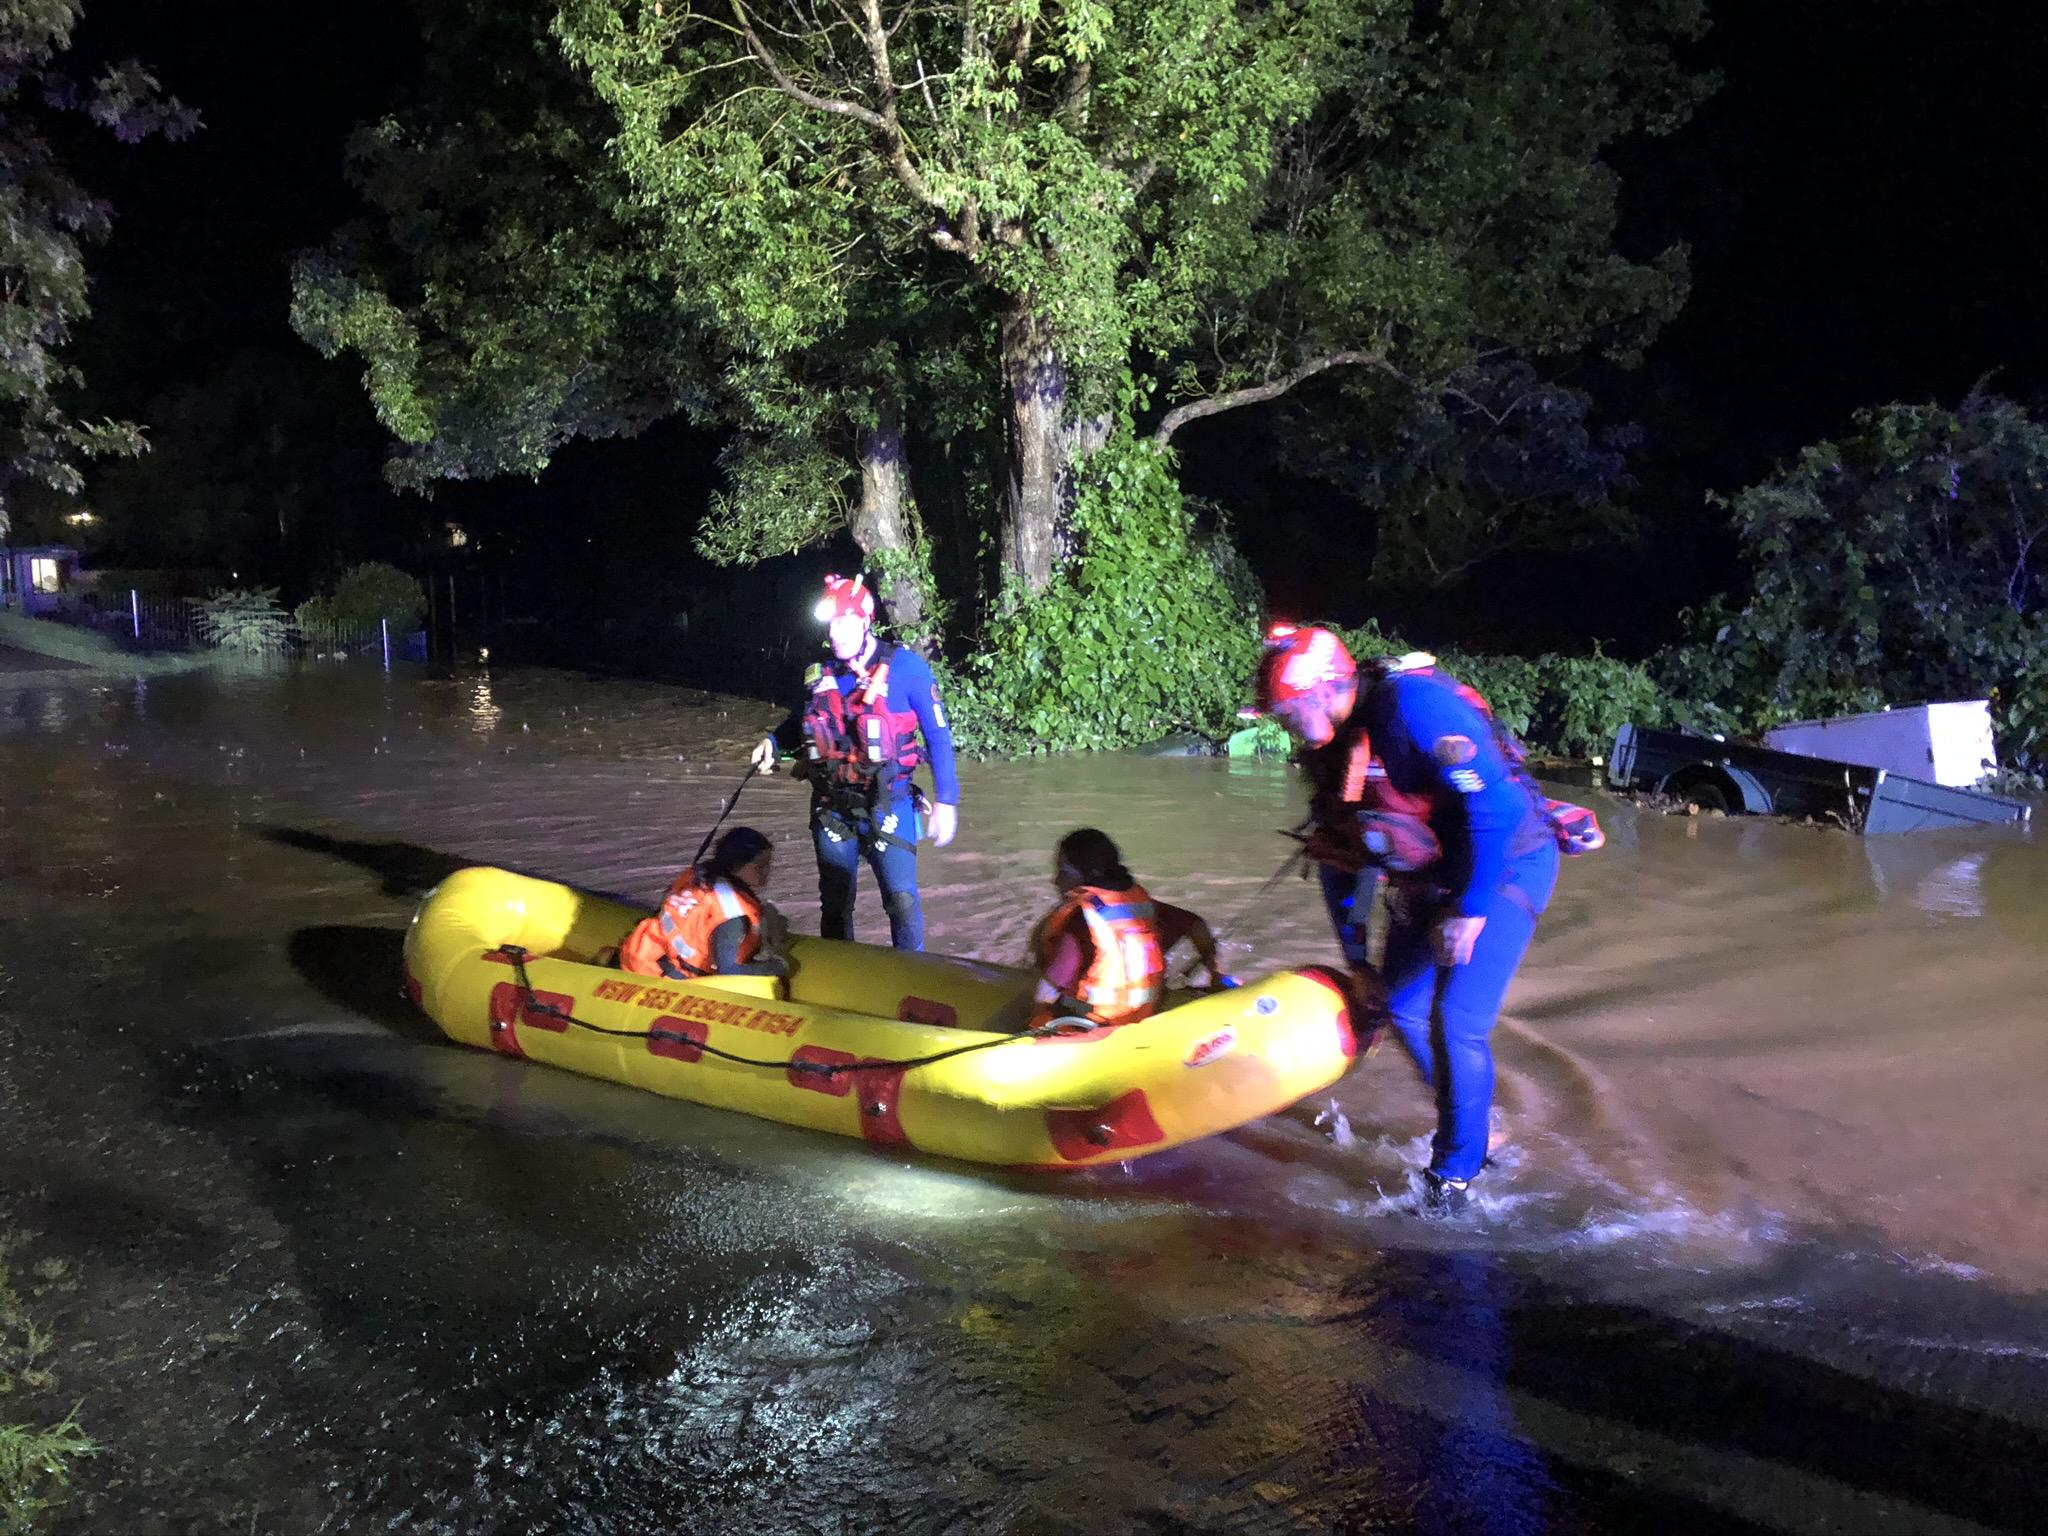 Coffs Harbour flood rescue specialists bring children to safety